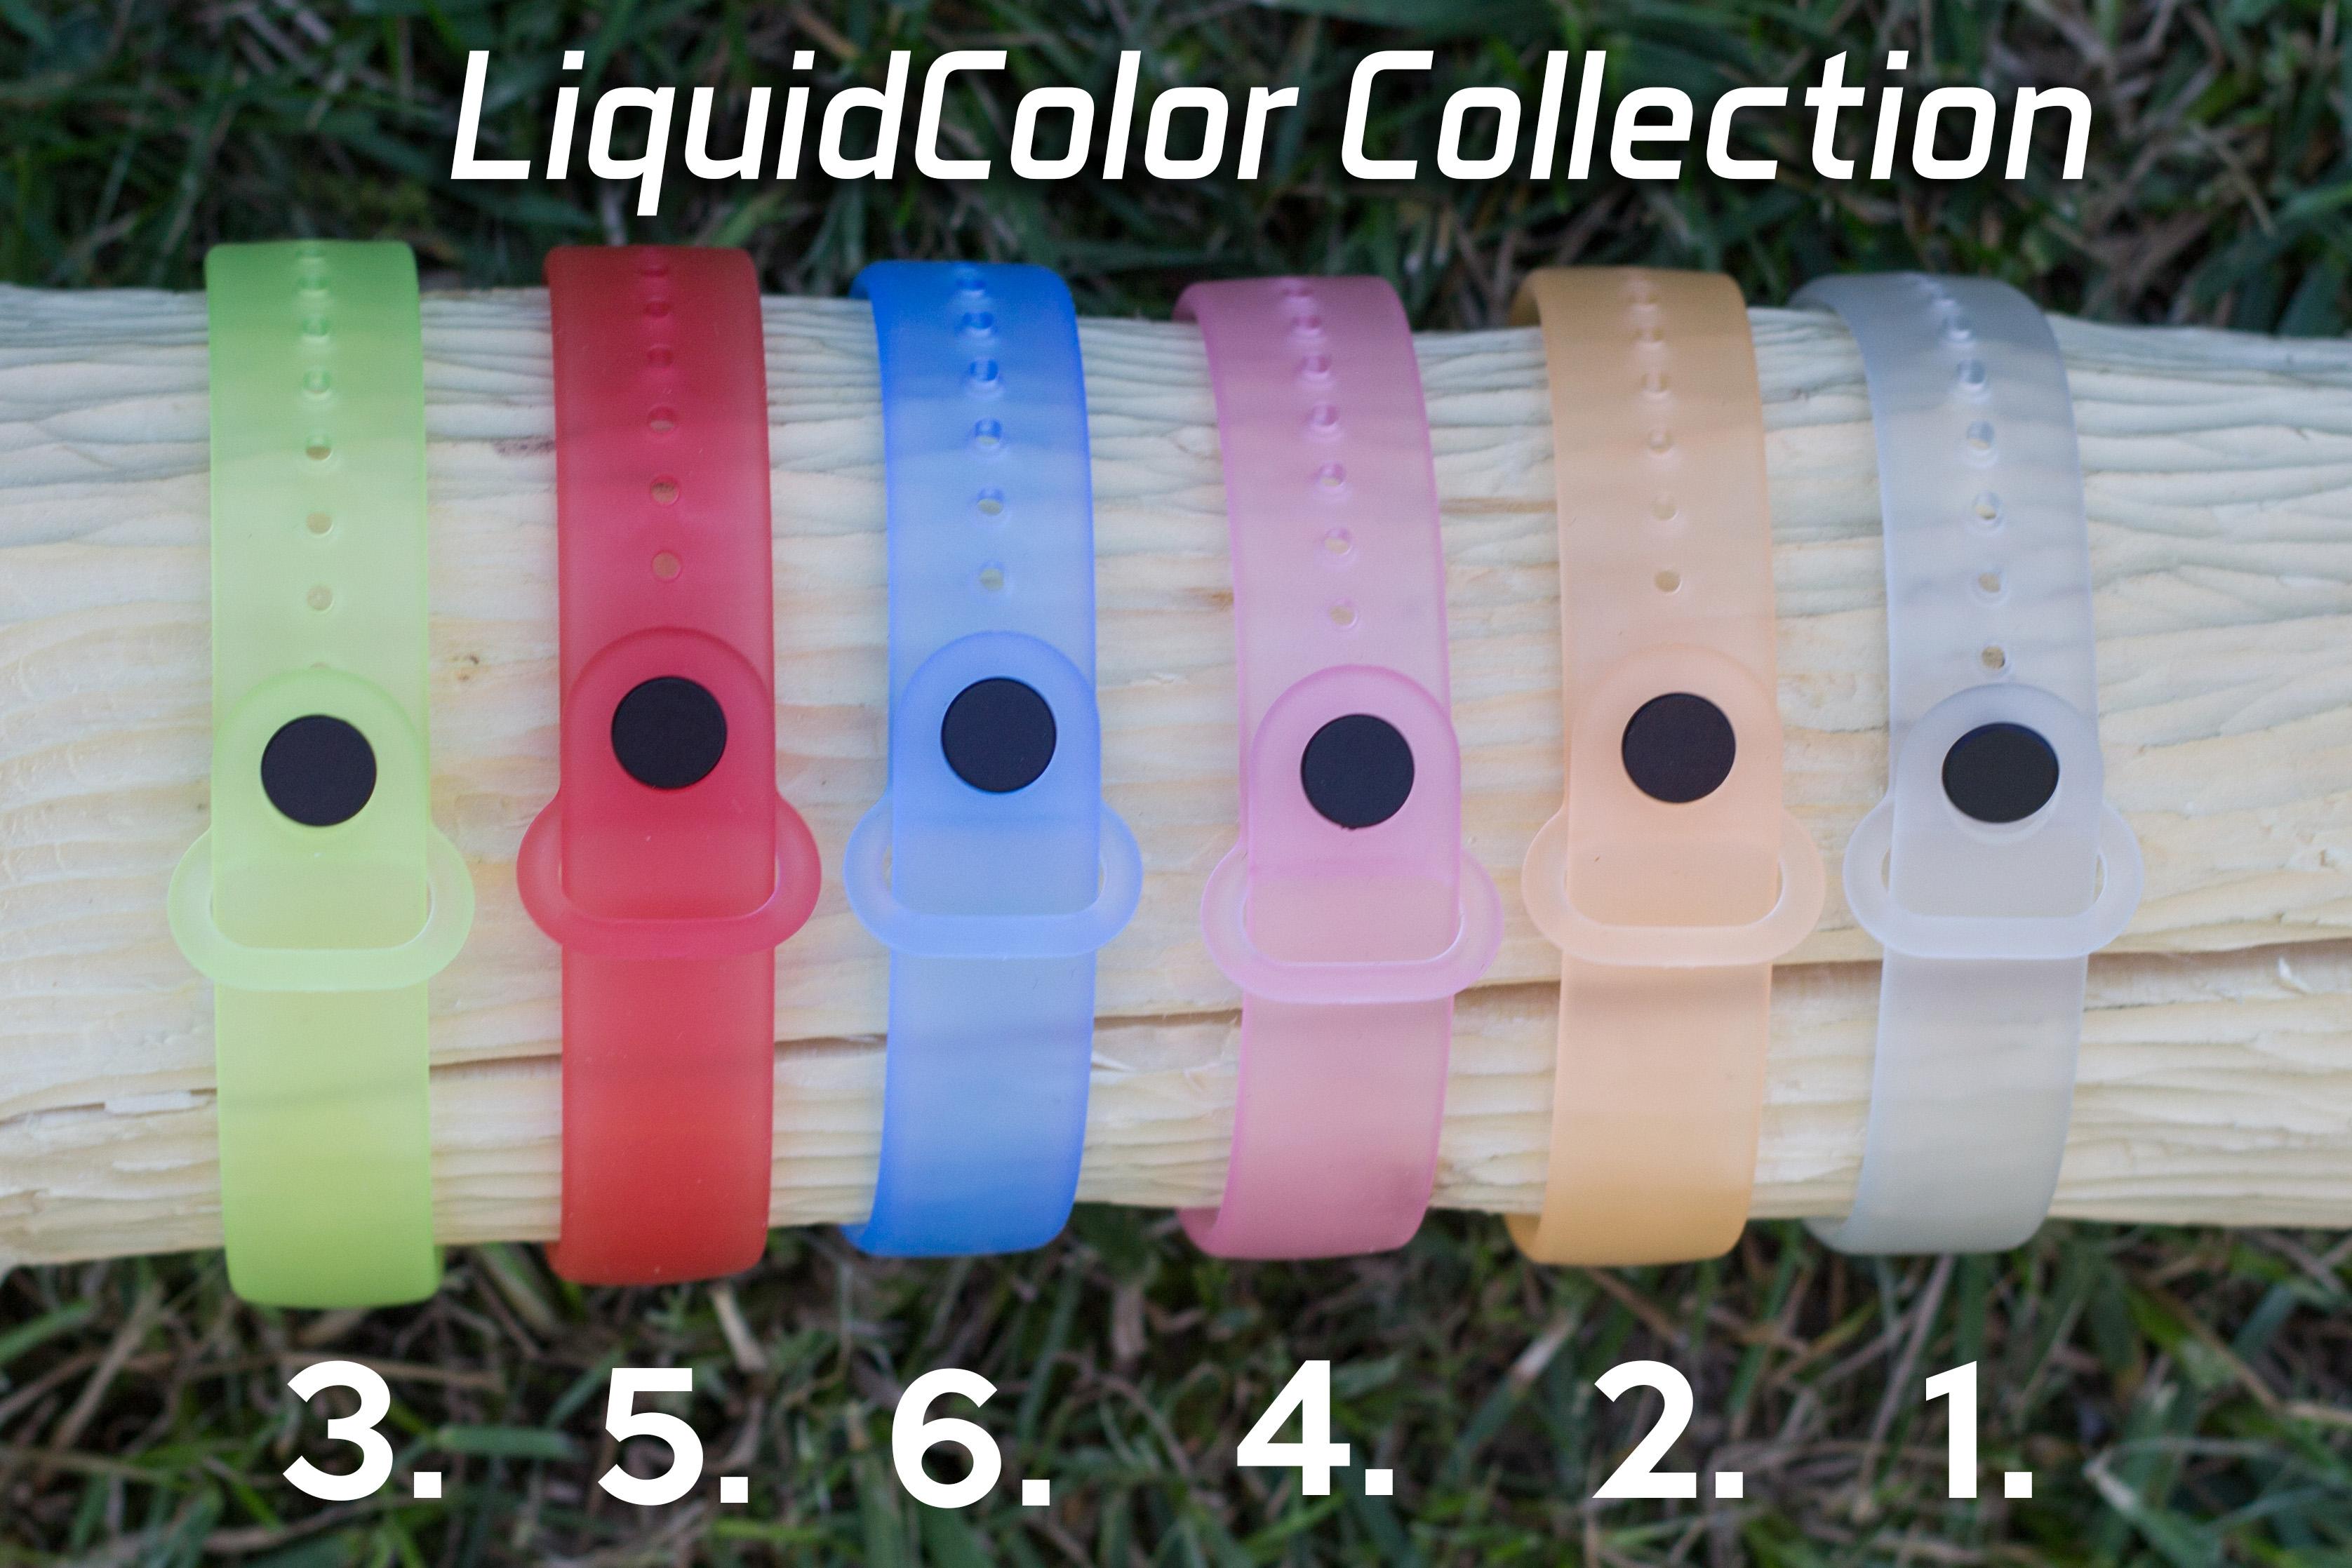 Mi Band 3 szilikon pánt - LiquidColor 4